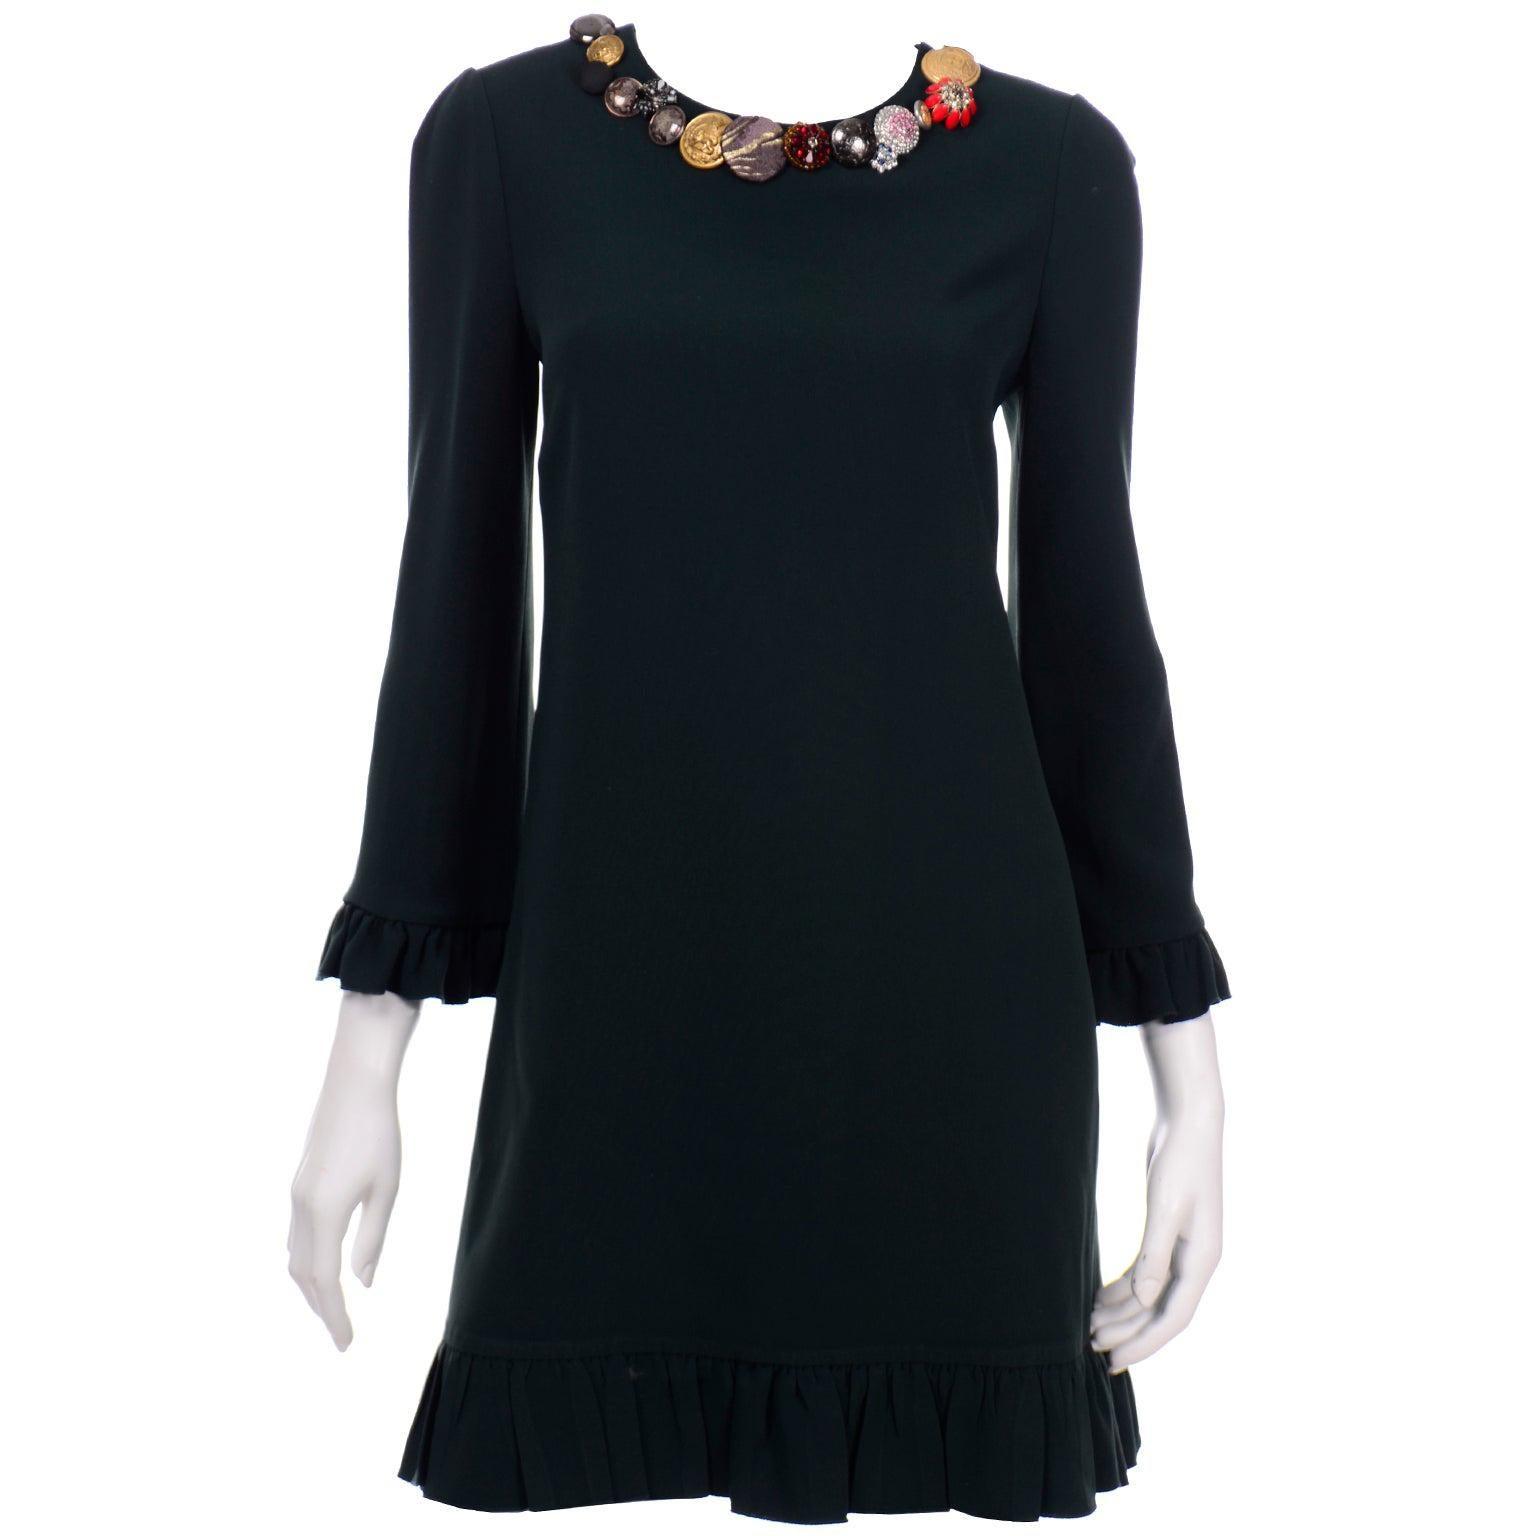 Dolce & Gabbana Green Ruffled Dress With Decorative Button Trim